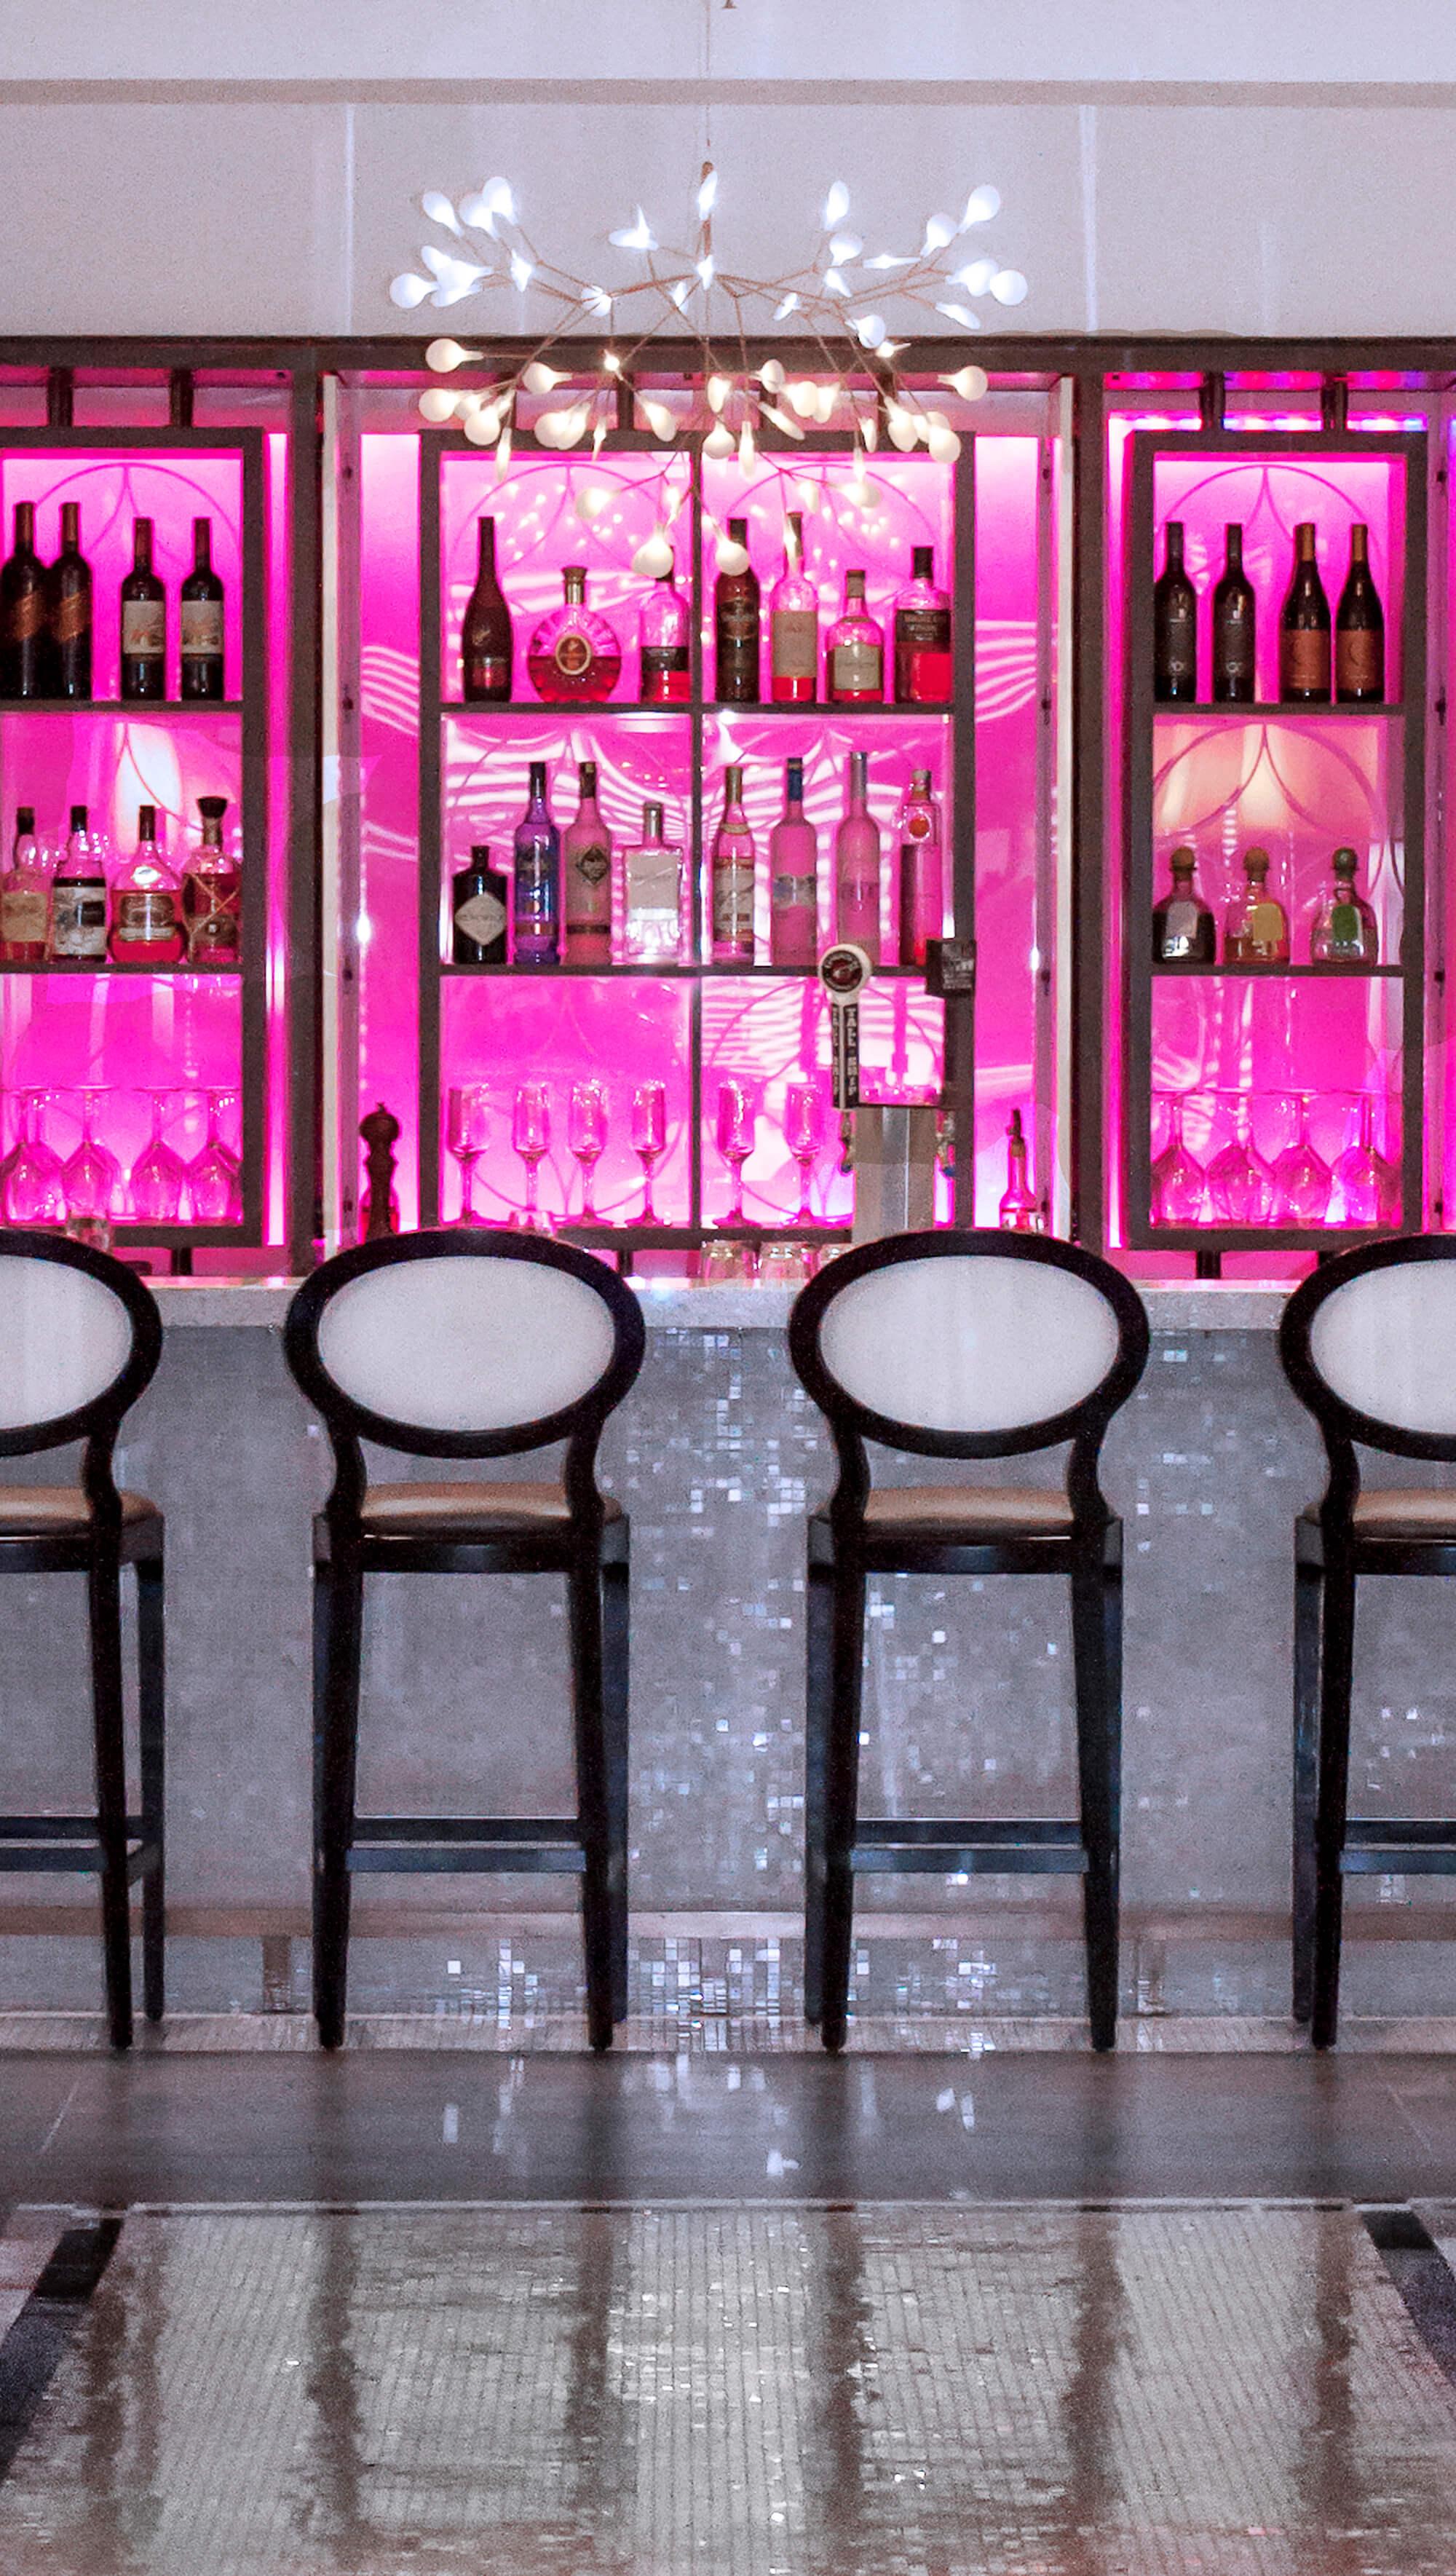 7 PrinceGeorge Lobby bar